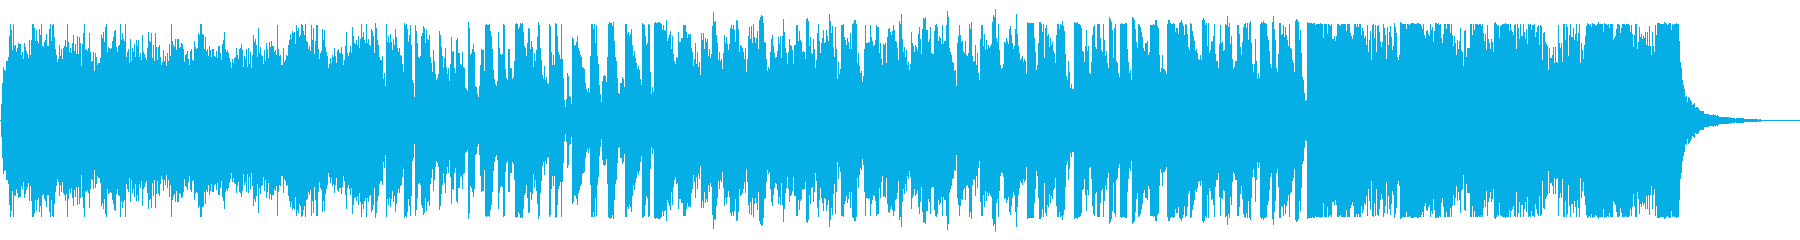 KANTクールな商品紹介用BGMの再生済みの波形